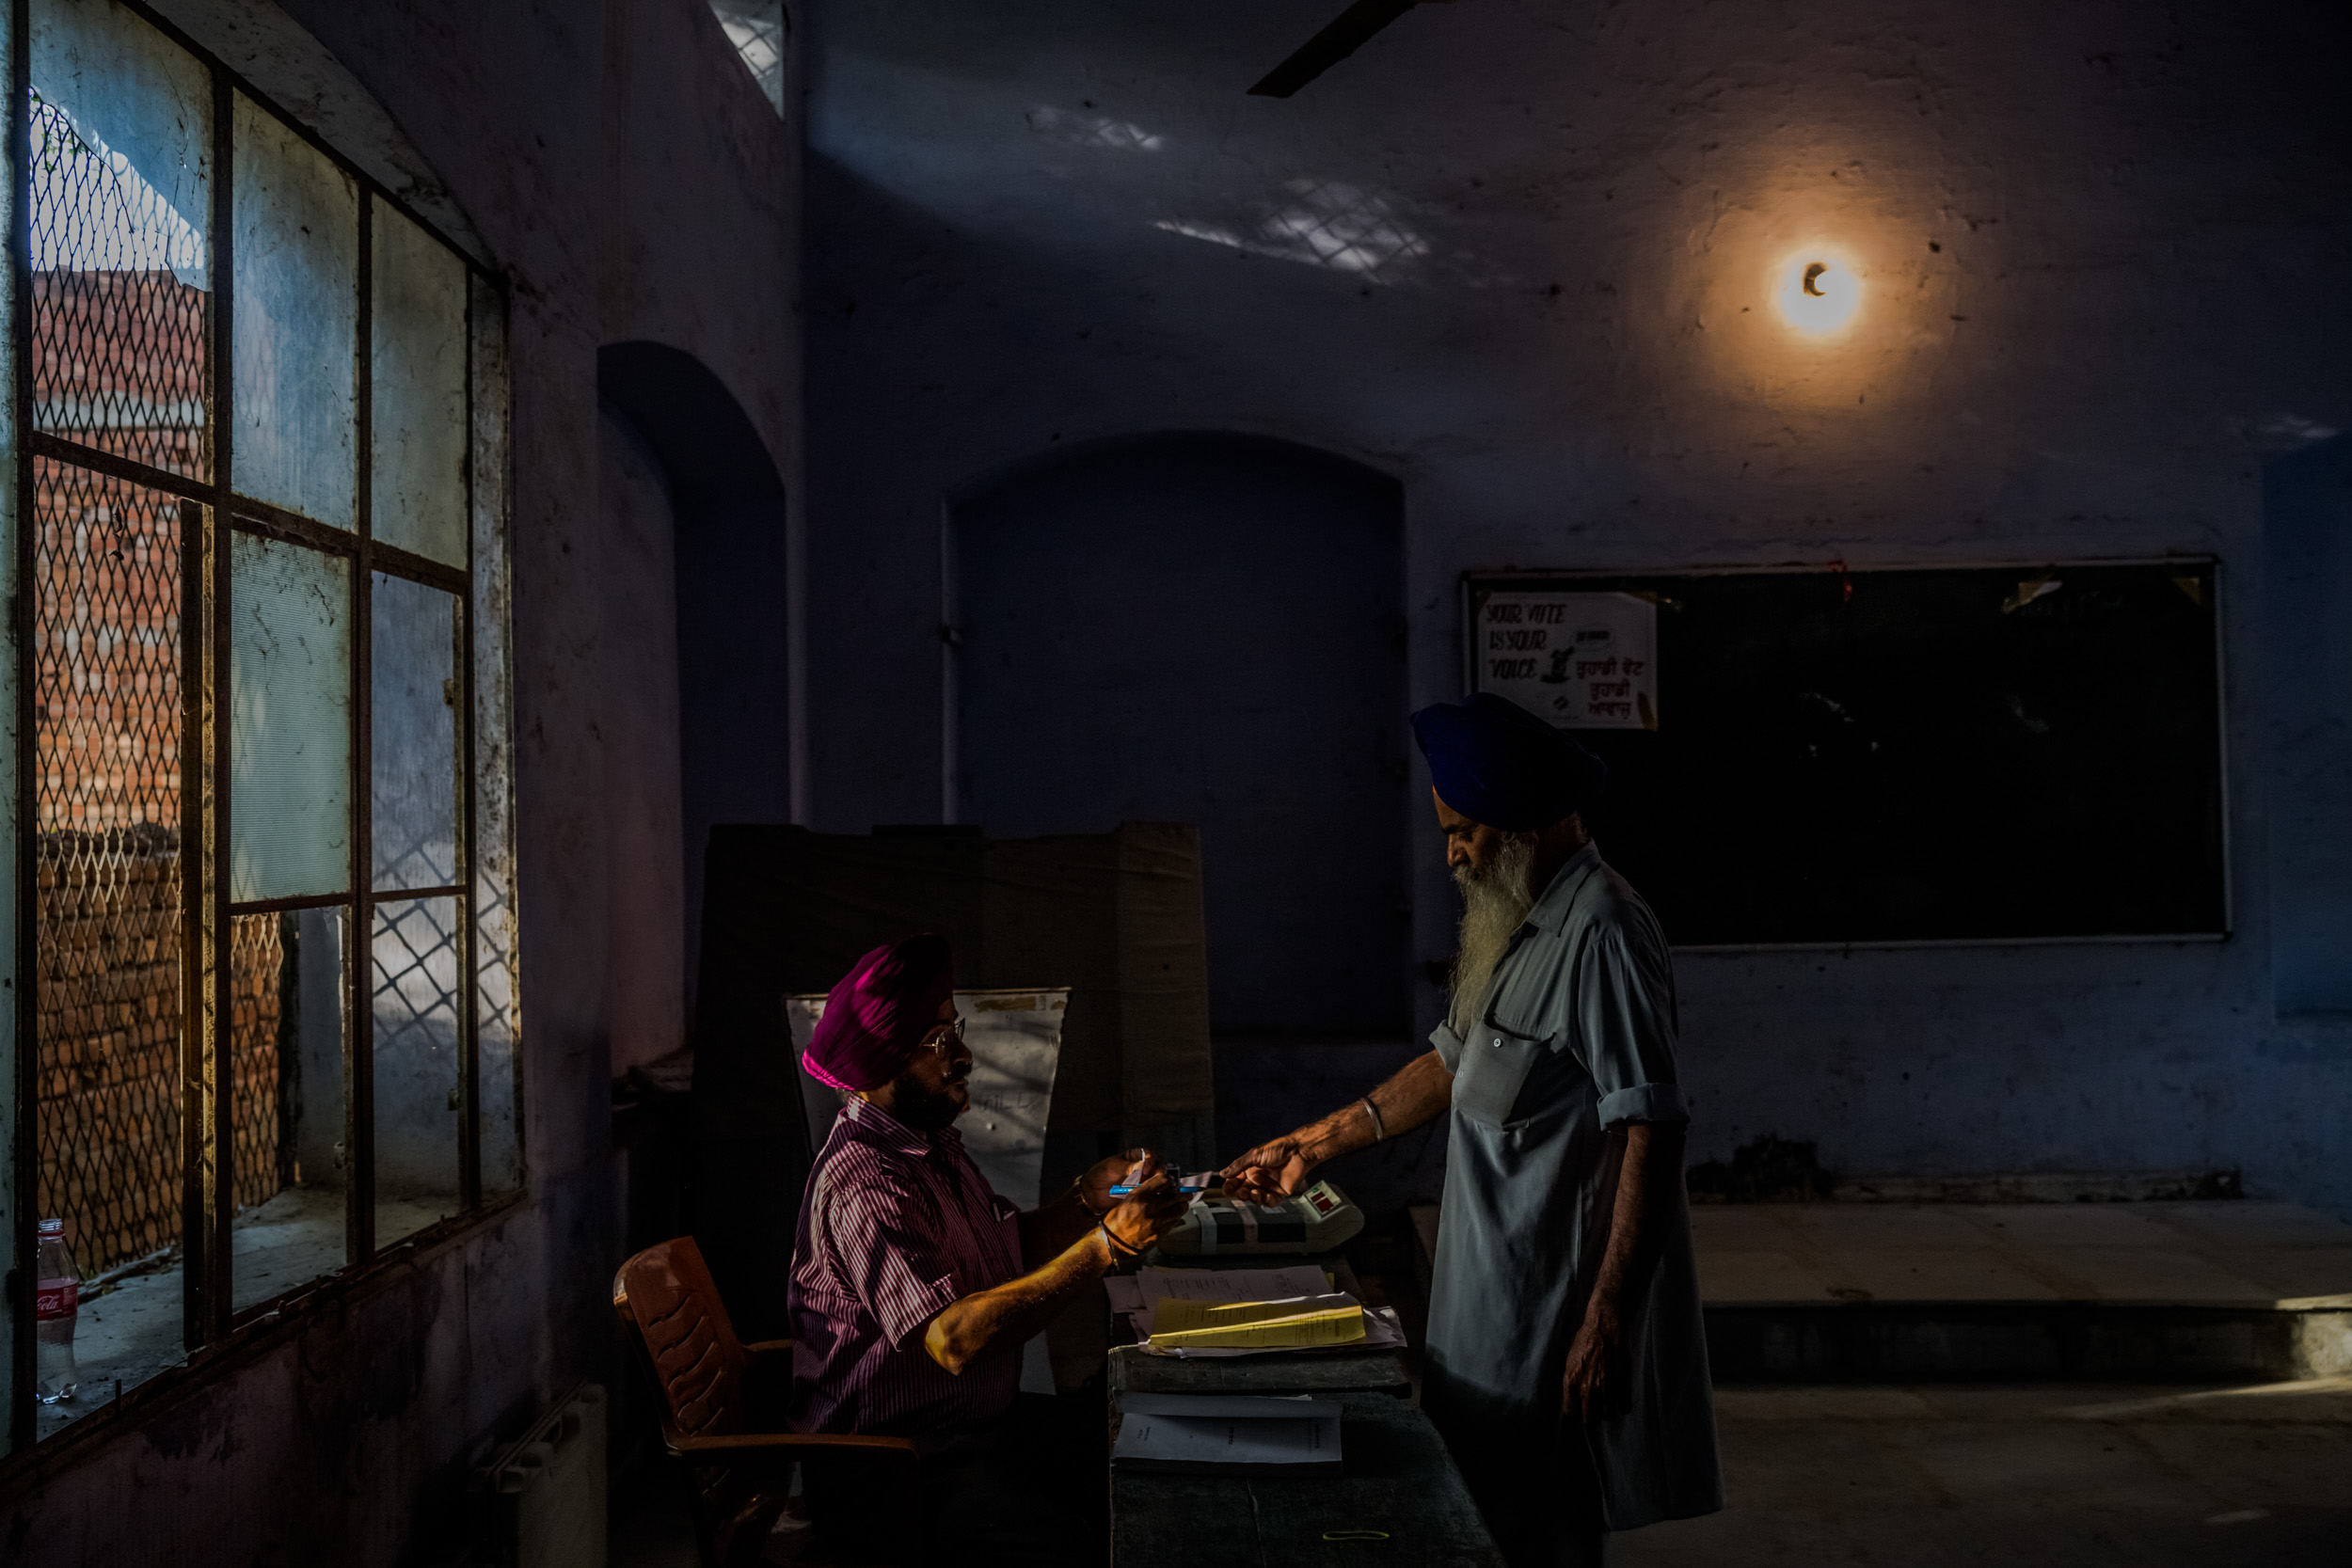 2014_04_30_DB_Punjab_0025.jpg